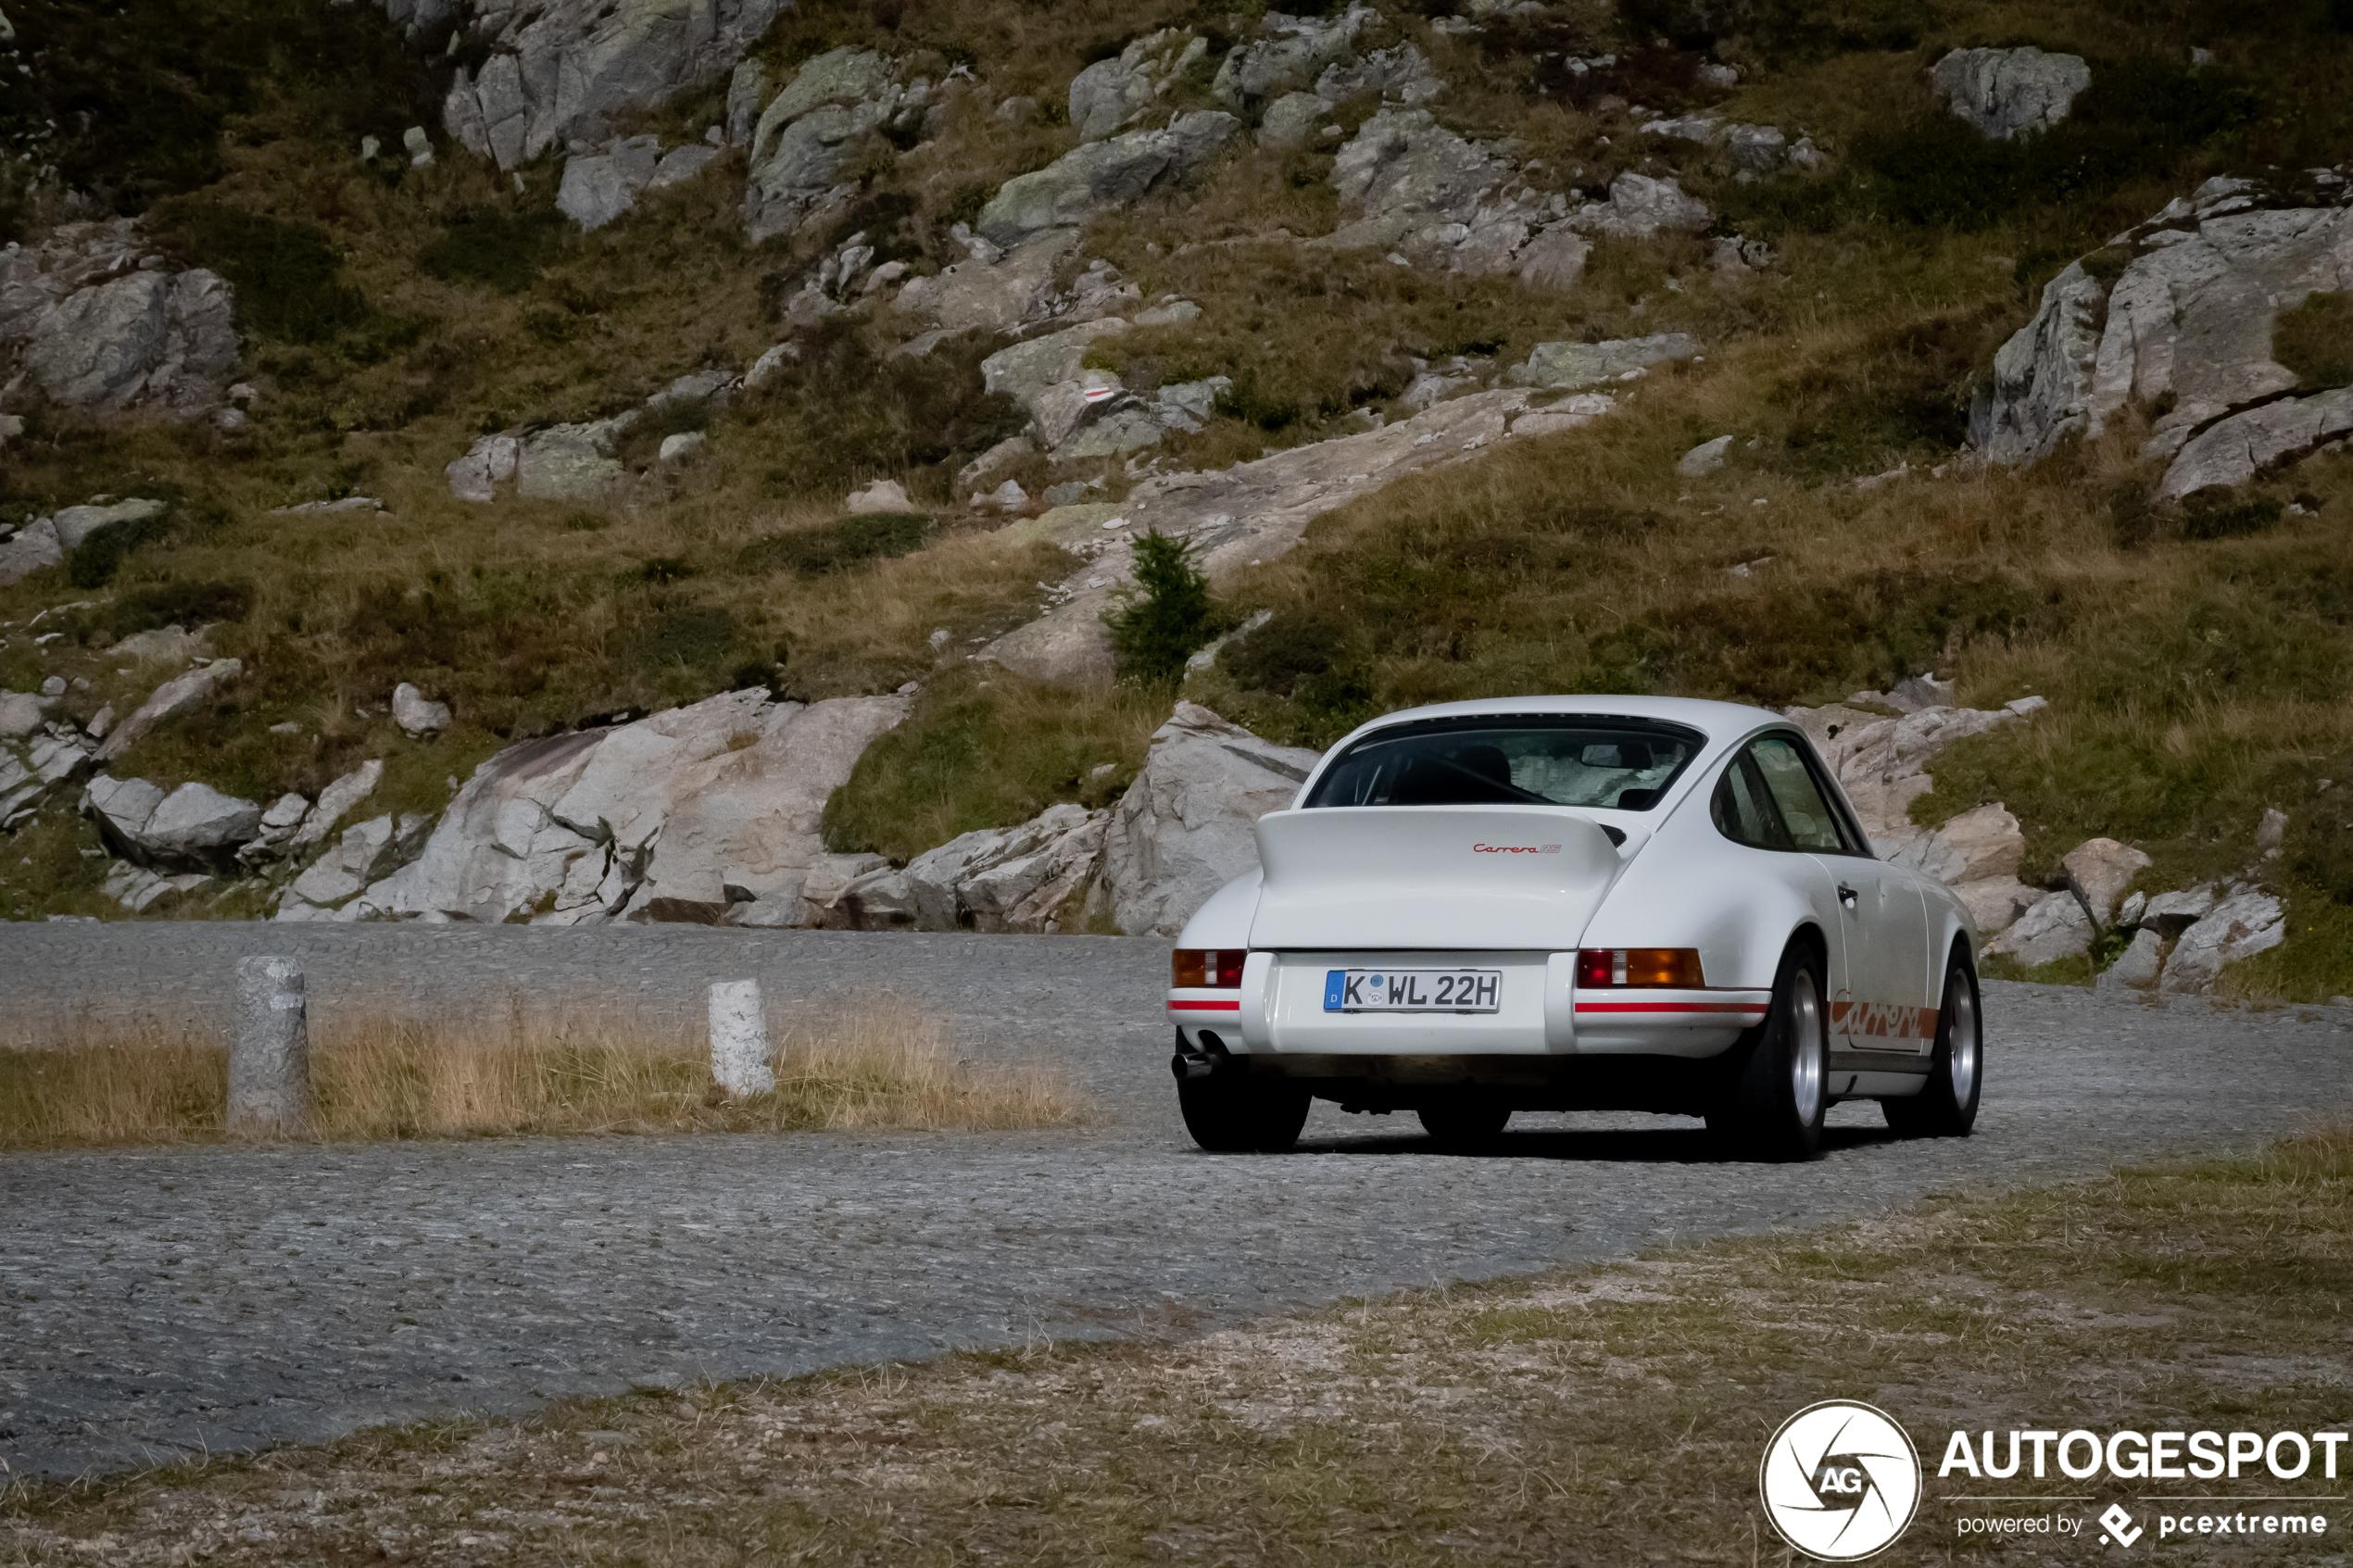 Porsche911 Carrera RS 2.7